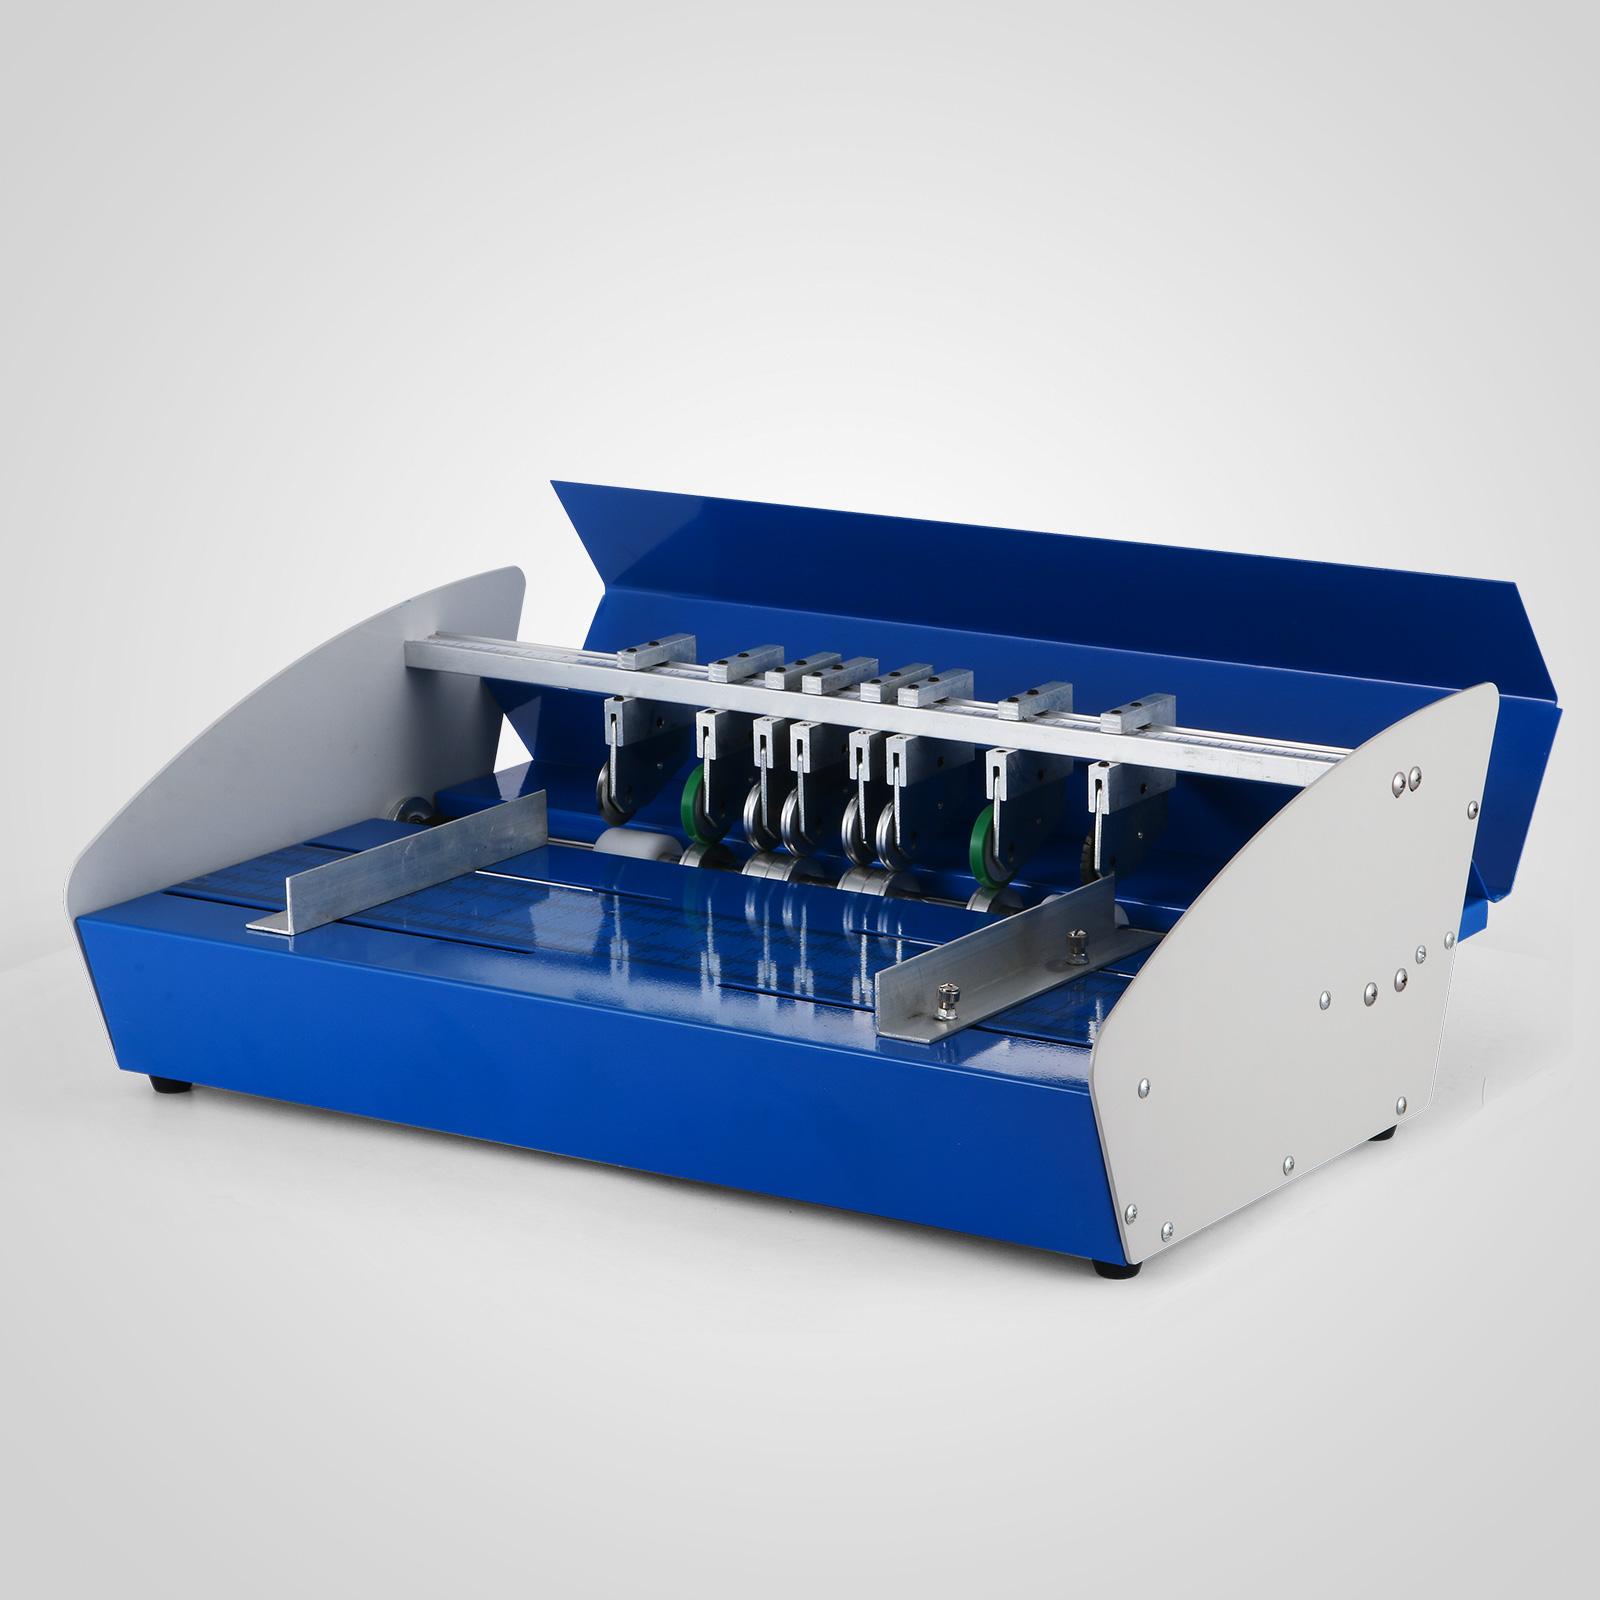 Cordonatrice-Perforatrice-Max-350-520mm-Profondita-Regolabile-Elettrica-Manuale miniatura 28